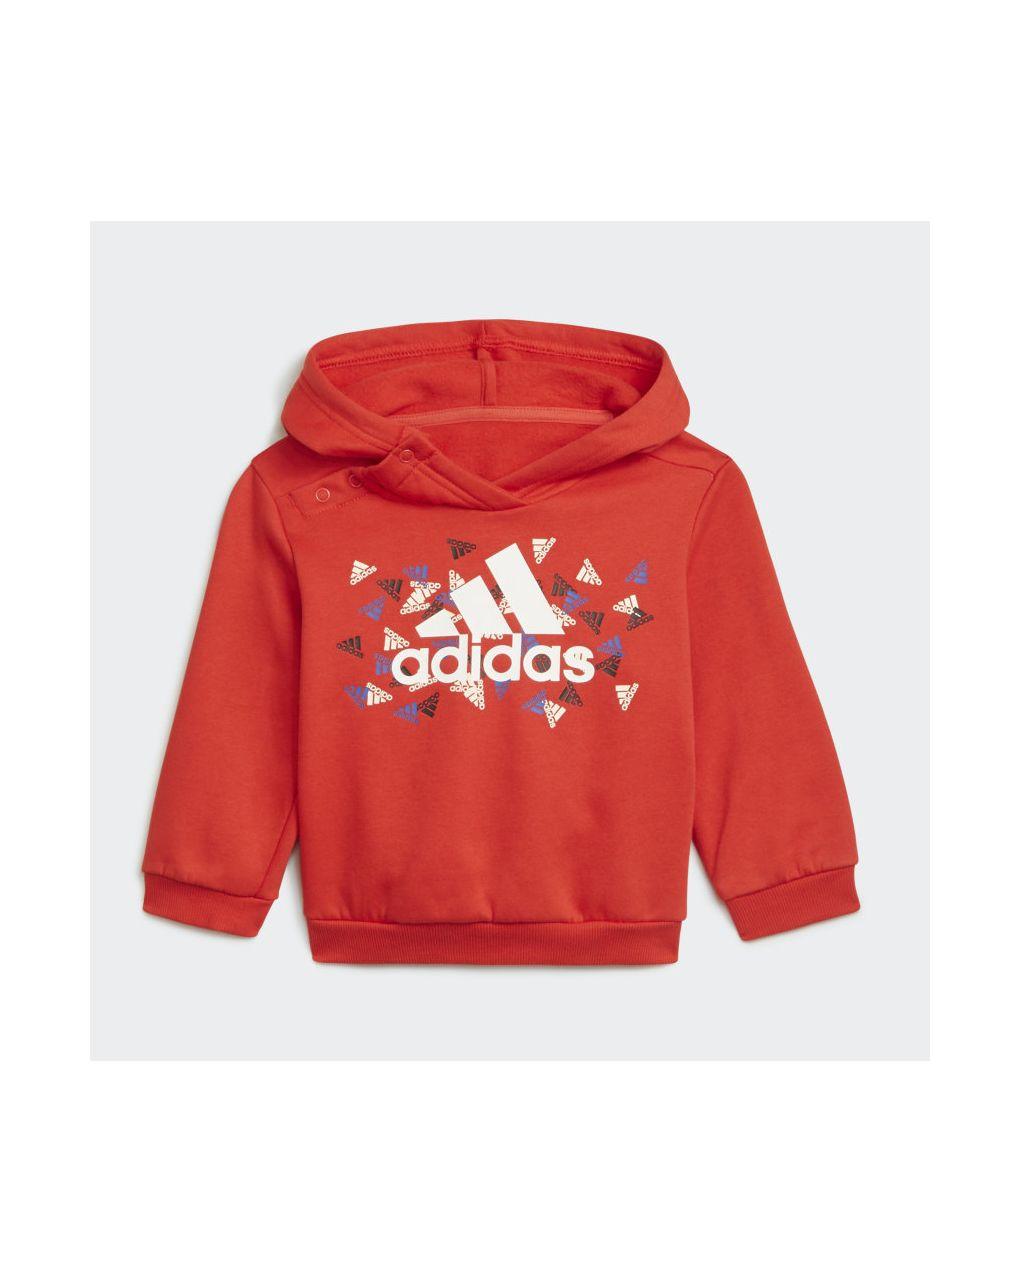 Adidas Σετ Φόρμας Badge of Sport Κόκκινο για Αγόρι H28842